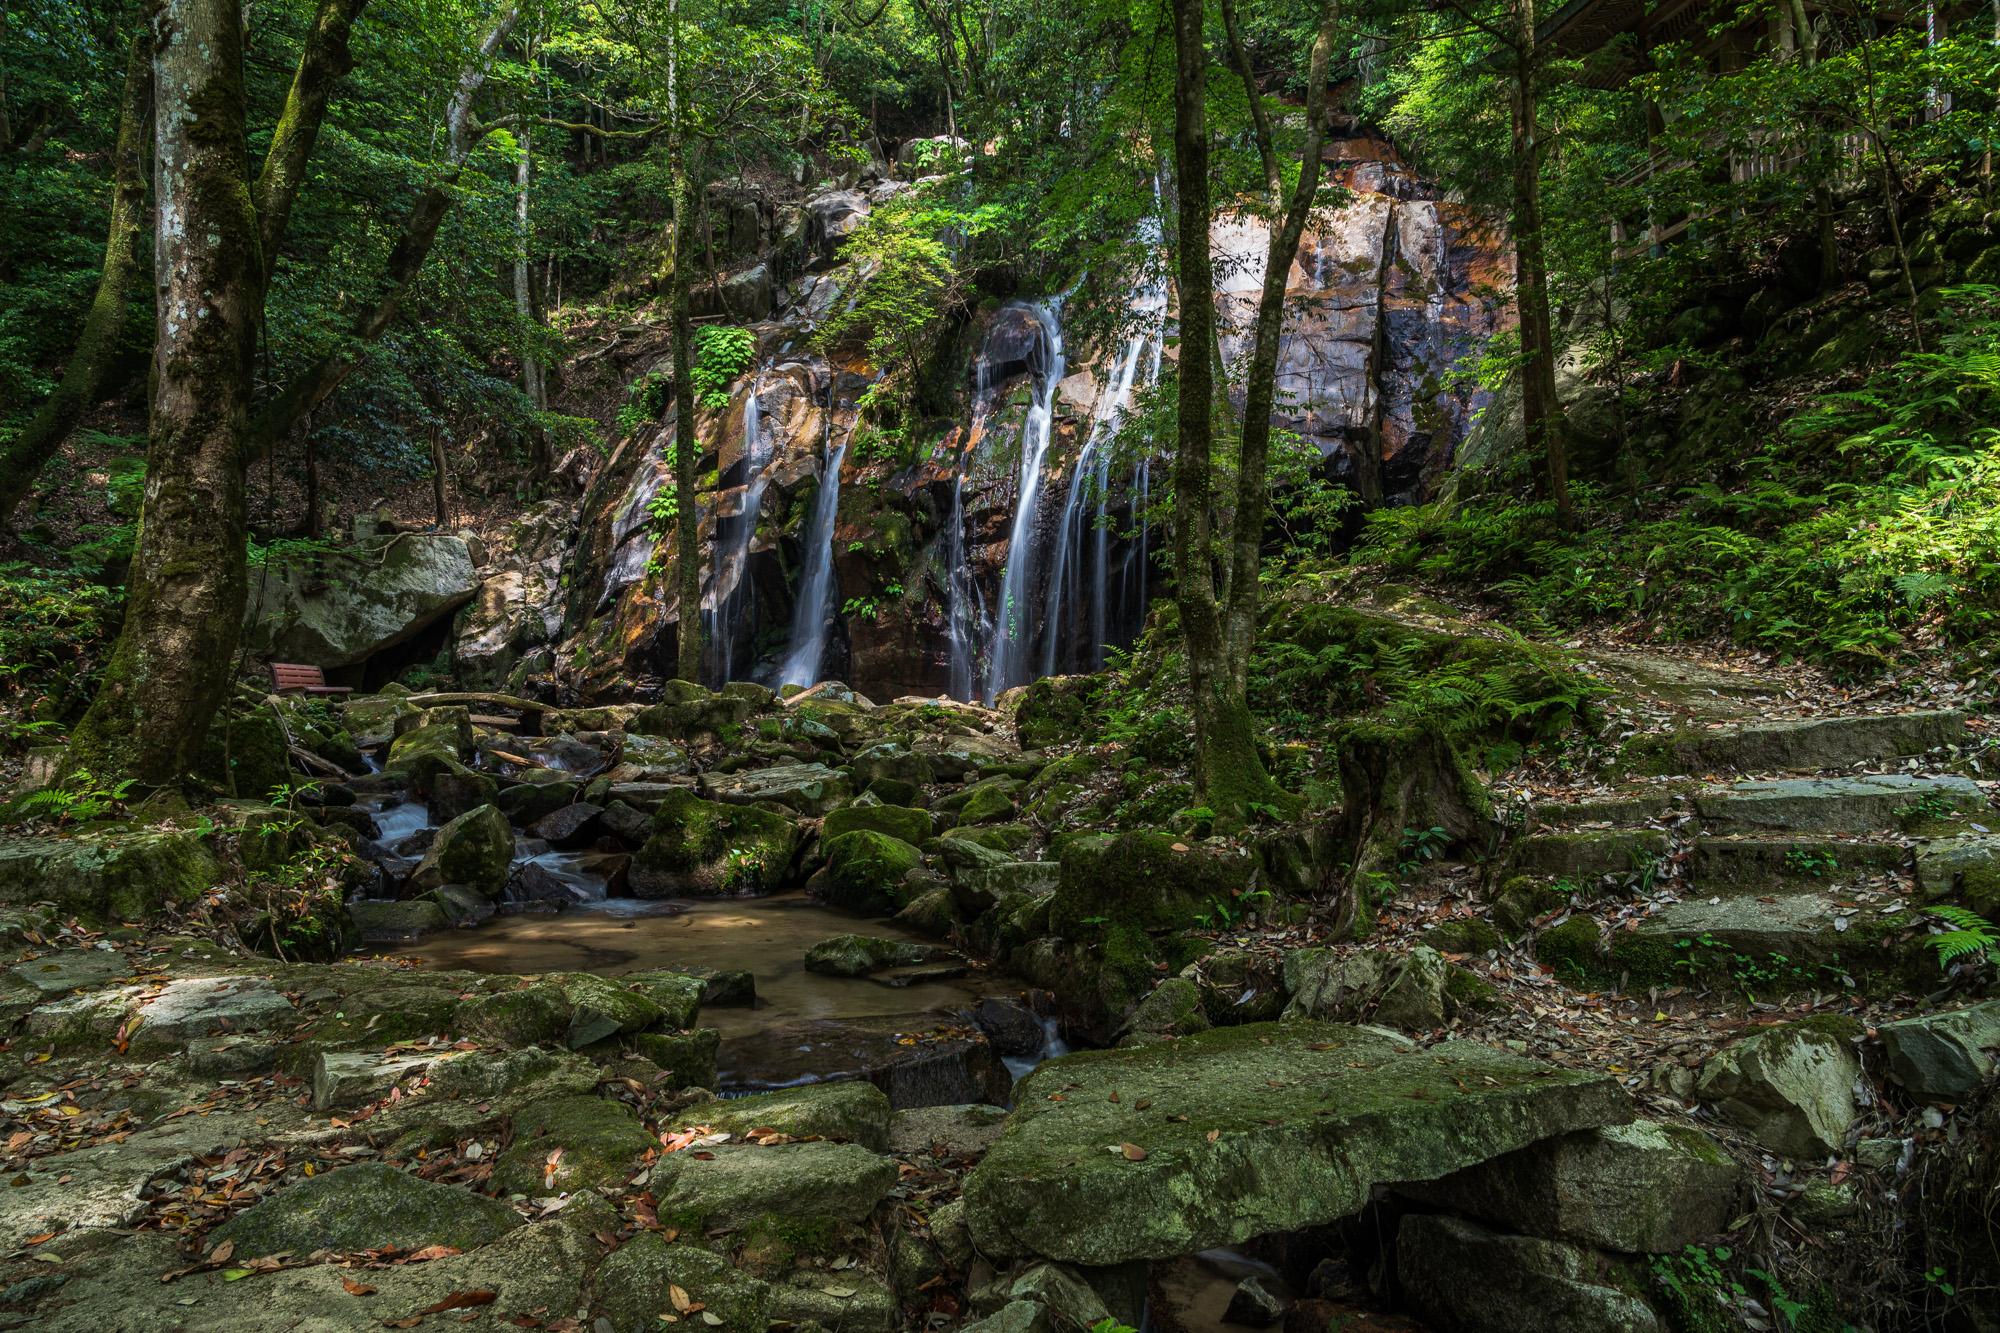 DSC04604-Edit 京都 金引の滝(日本の滝百選に選定された秘境の滝スポット!写真の紹介、アクセス情報など)